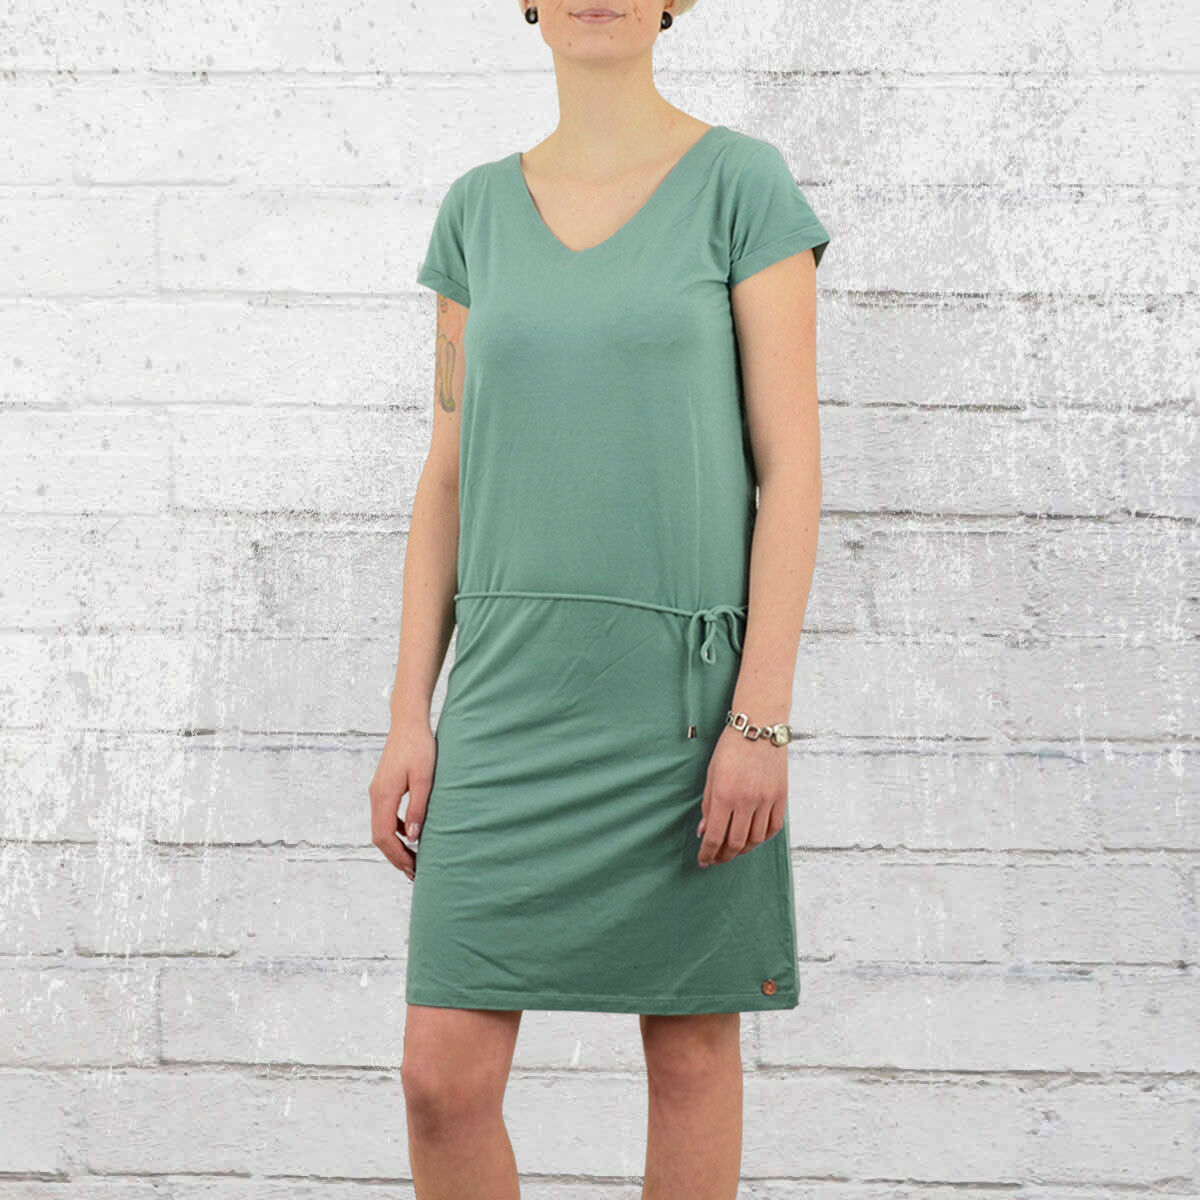 Grezzi Amburgo abito abito abito Leeloo Turchese Sportivo miniabito dress verde minerale 233cd9